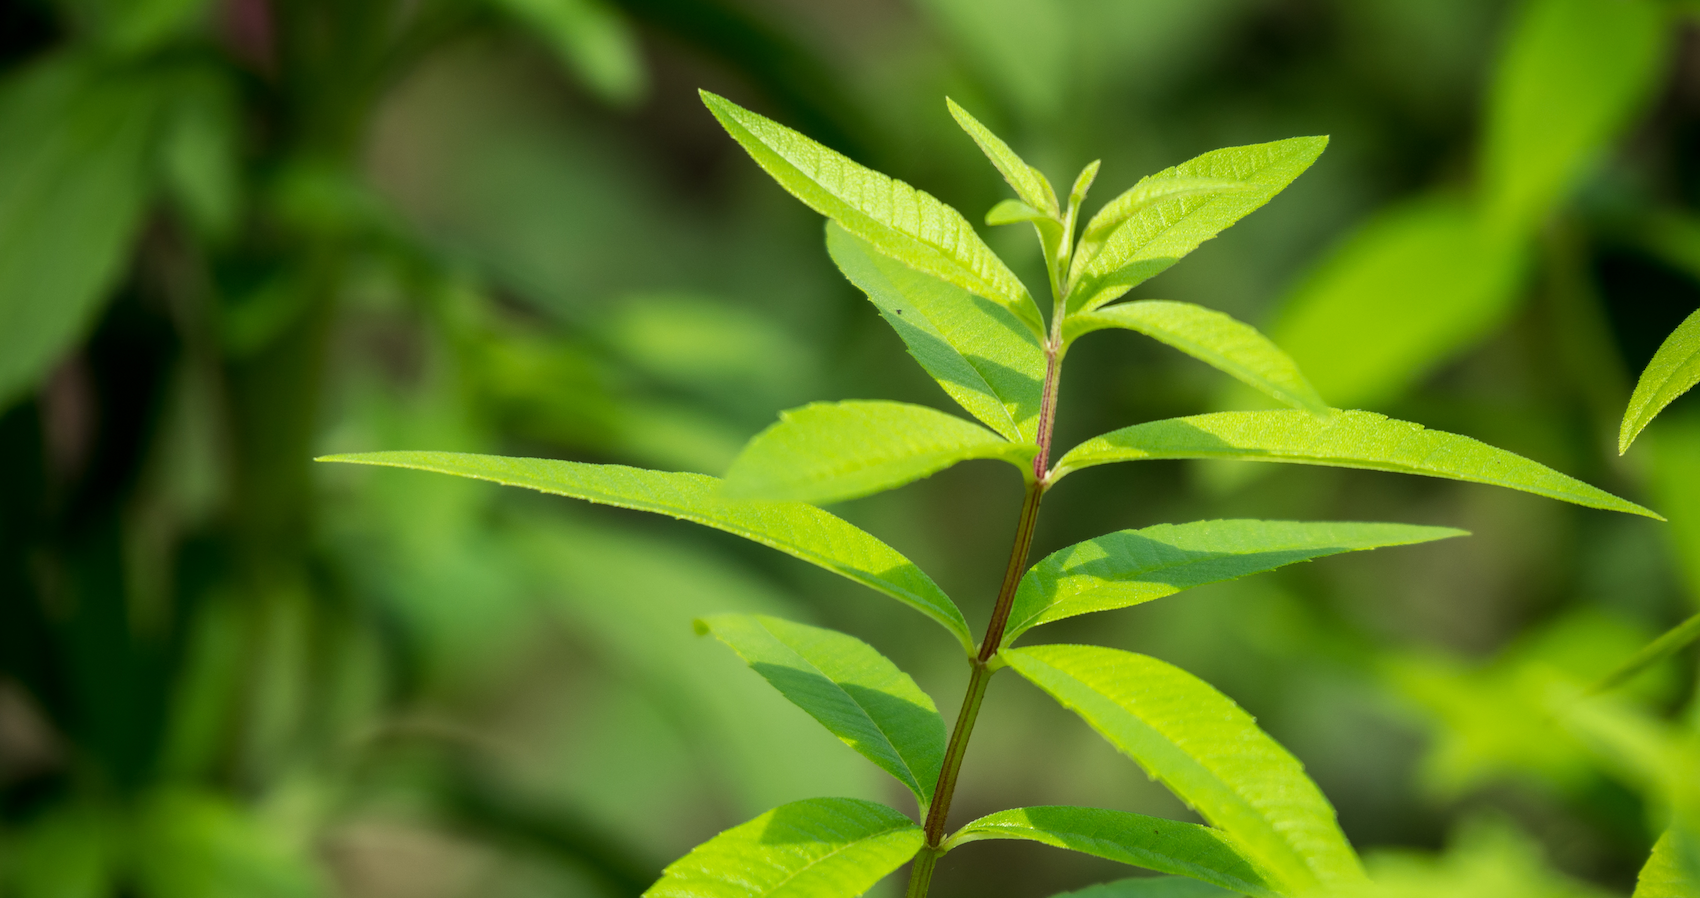 La verveine citronnée ou odorante, une huile essentielle 'rescue'